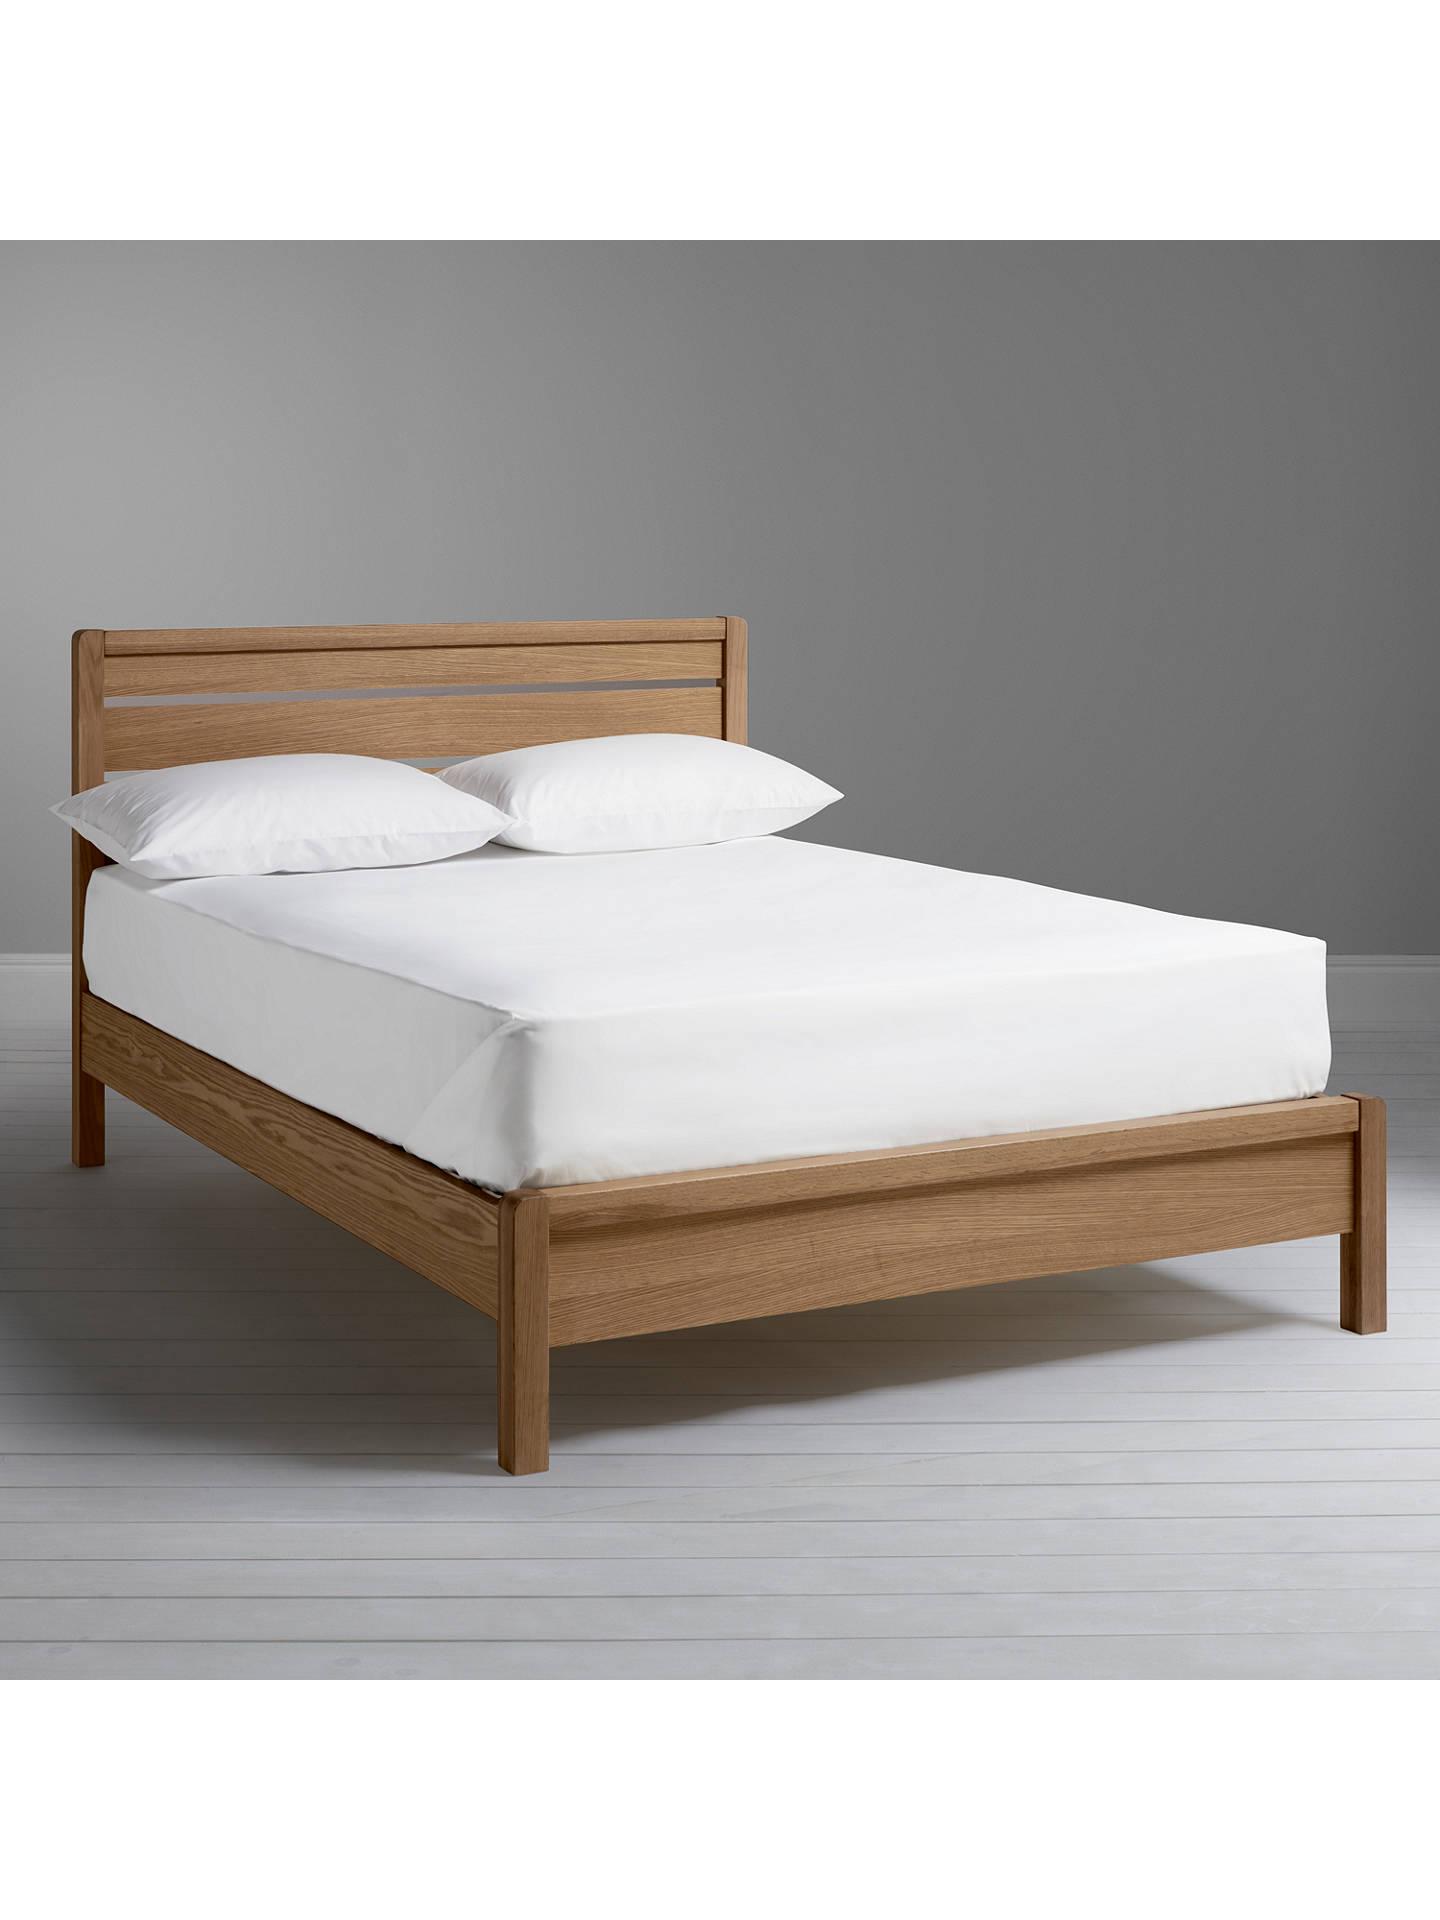 John Lewis & Partners Montreal Bed Frame, Double, Oak